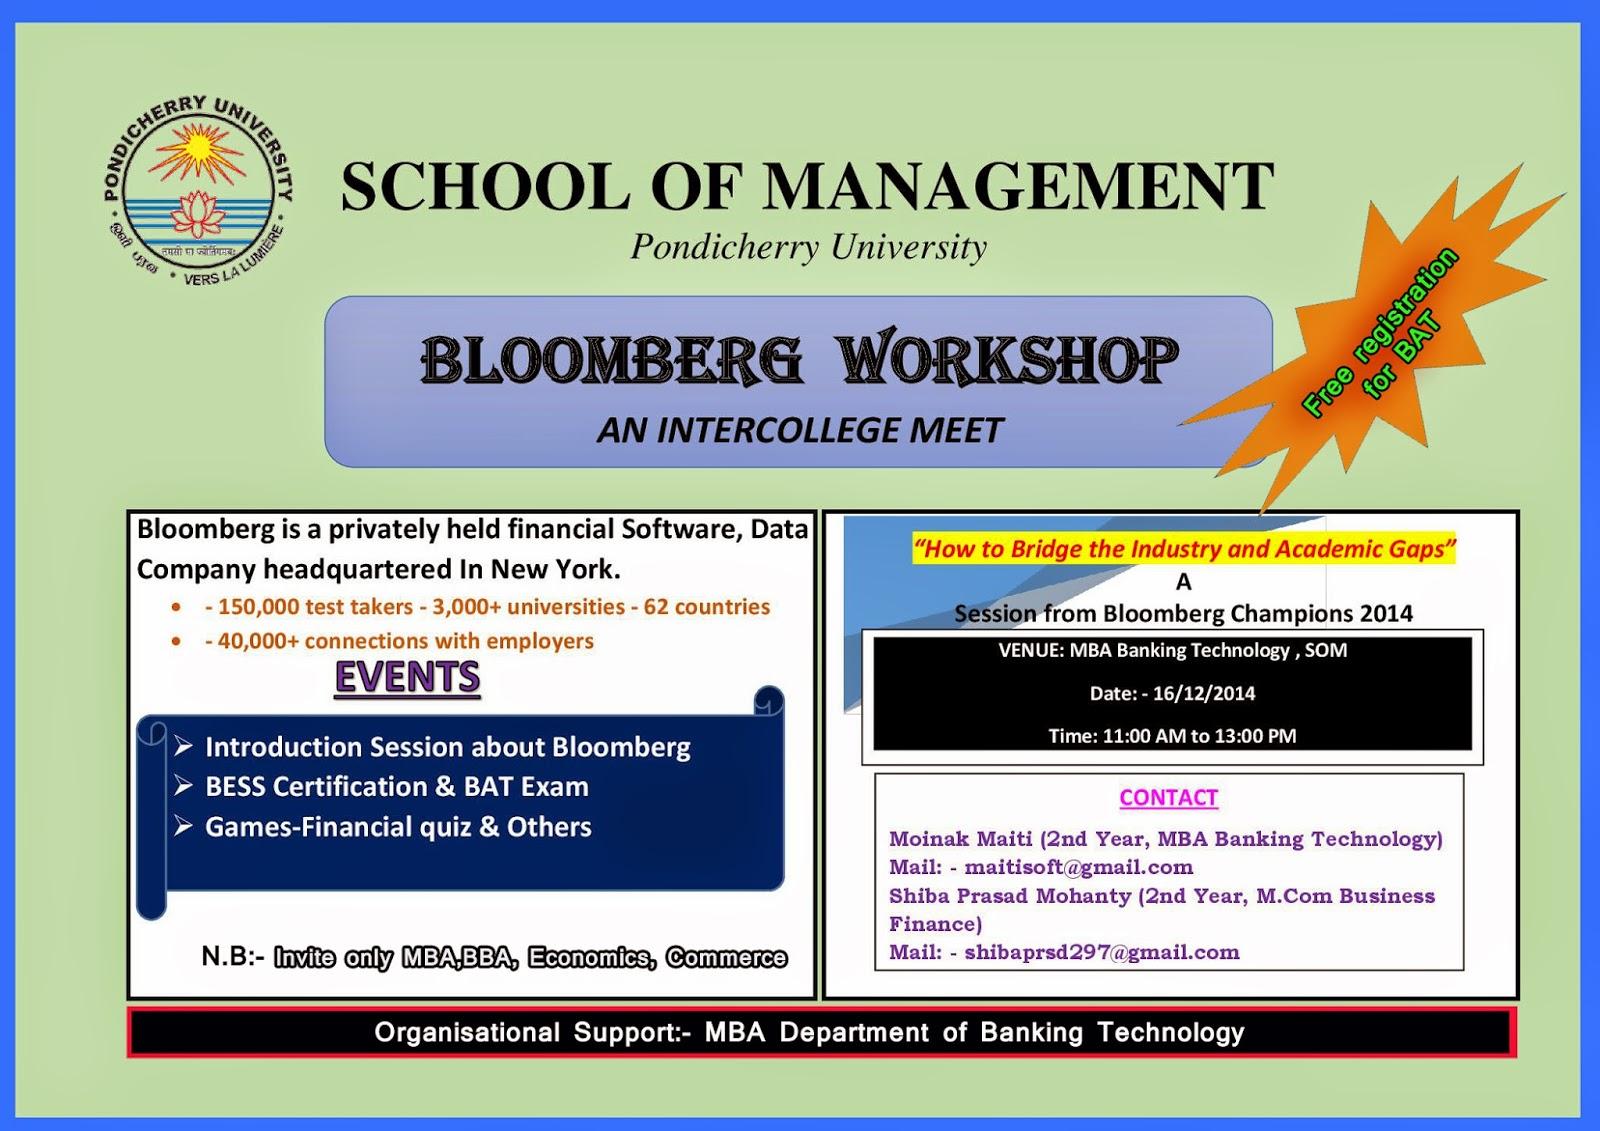 Economics Study Material Bloomberg Workshop In Pondicherry University